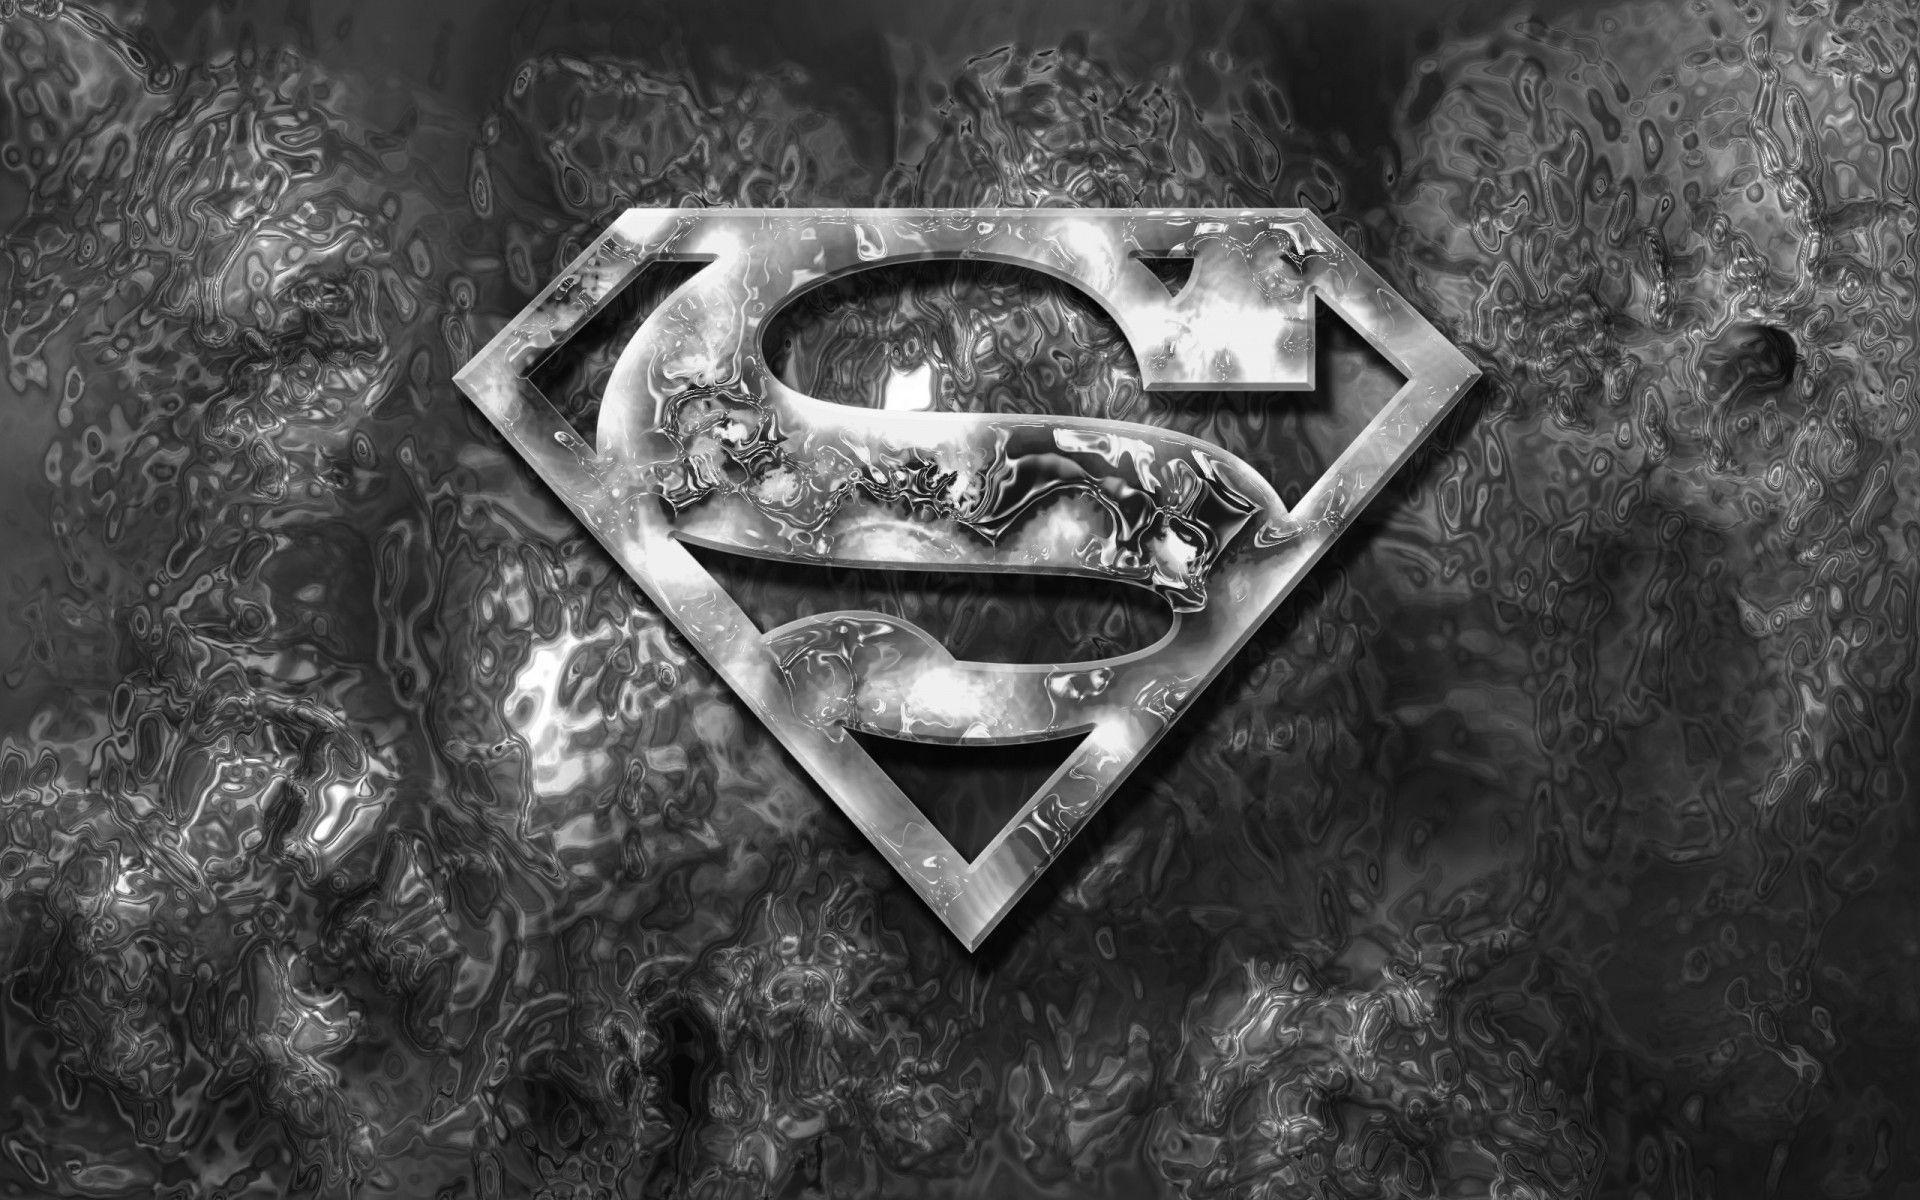 Hd wallpaper 1080p - Images For Superman Hd Wallpaper 1080p